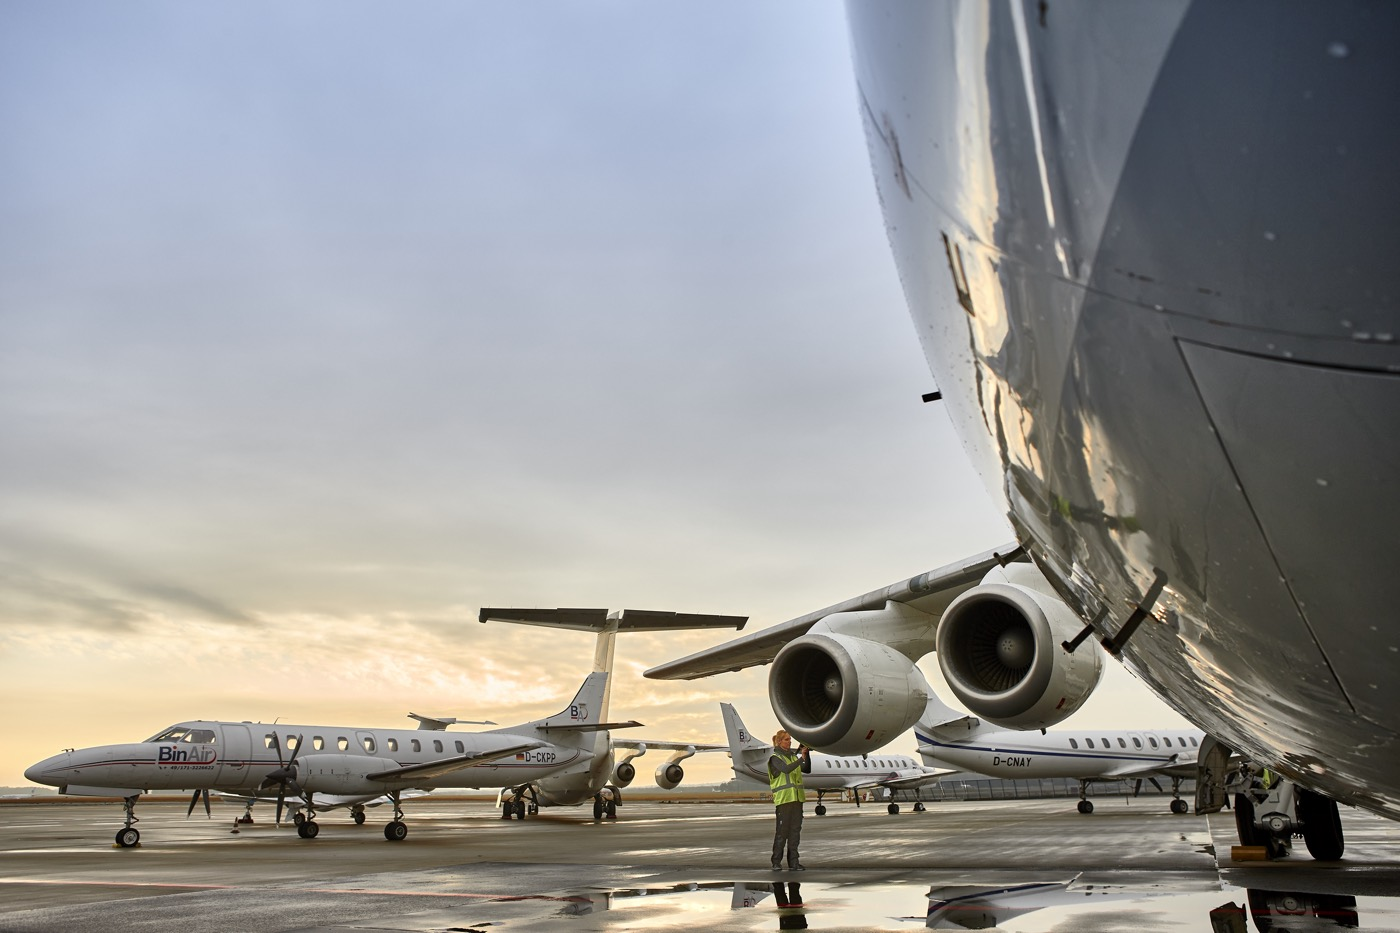 Industriefotografie, Industriefotograf, Fluggerätemechaniker, Ausbildung, Aerospace, Luftfahrt